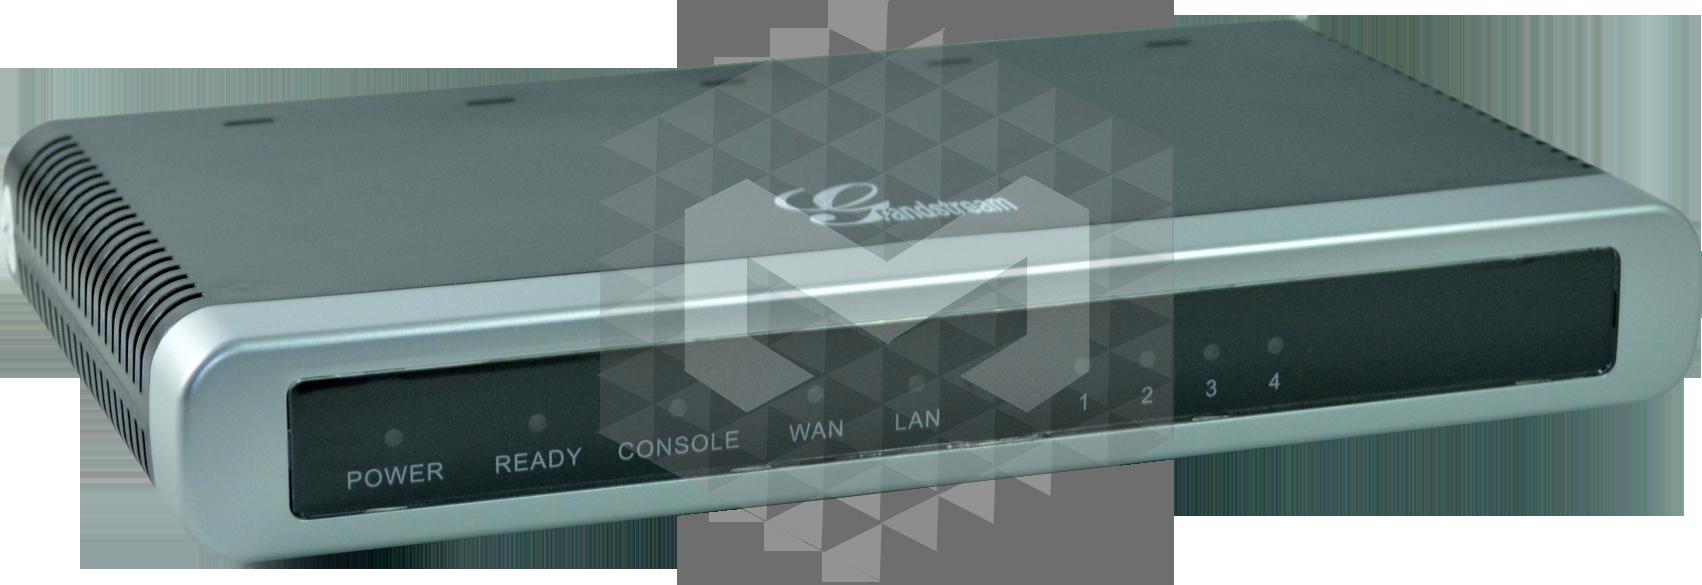 GXW4004-Grandstream-4FXS